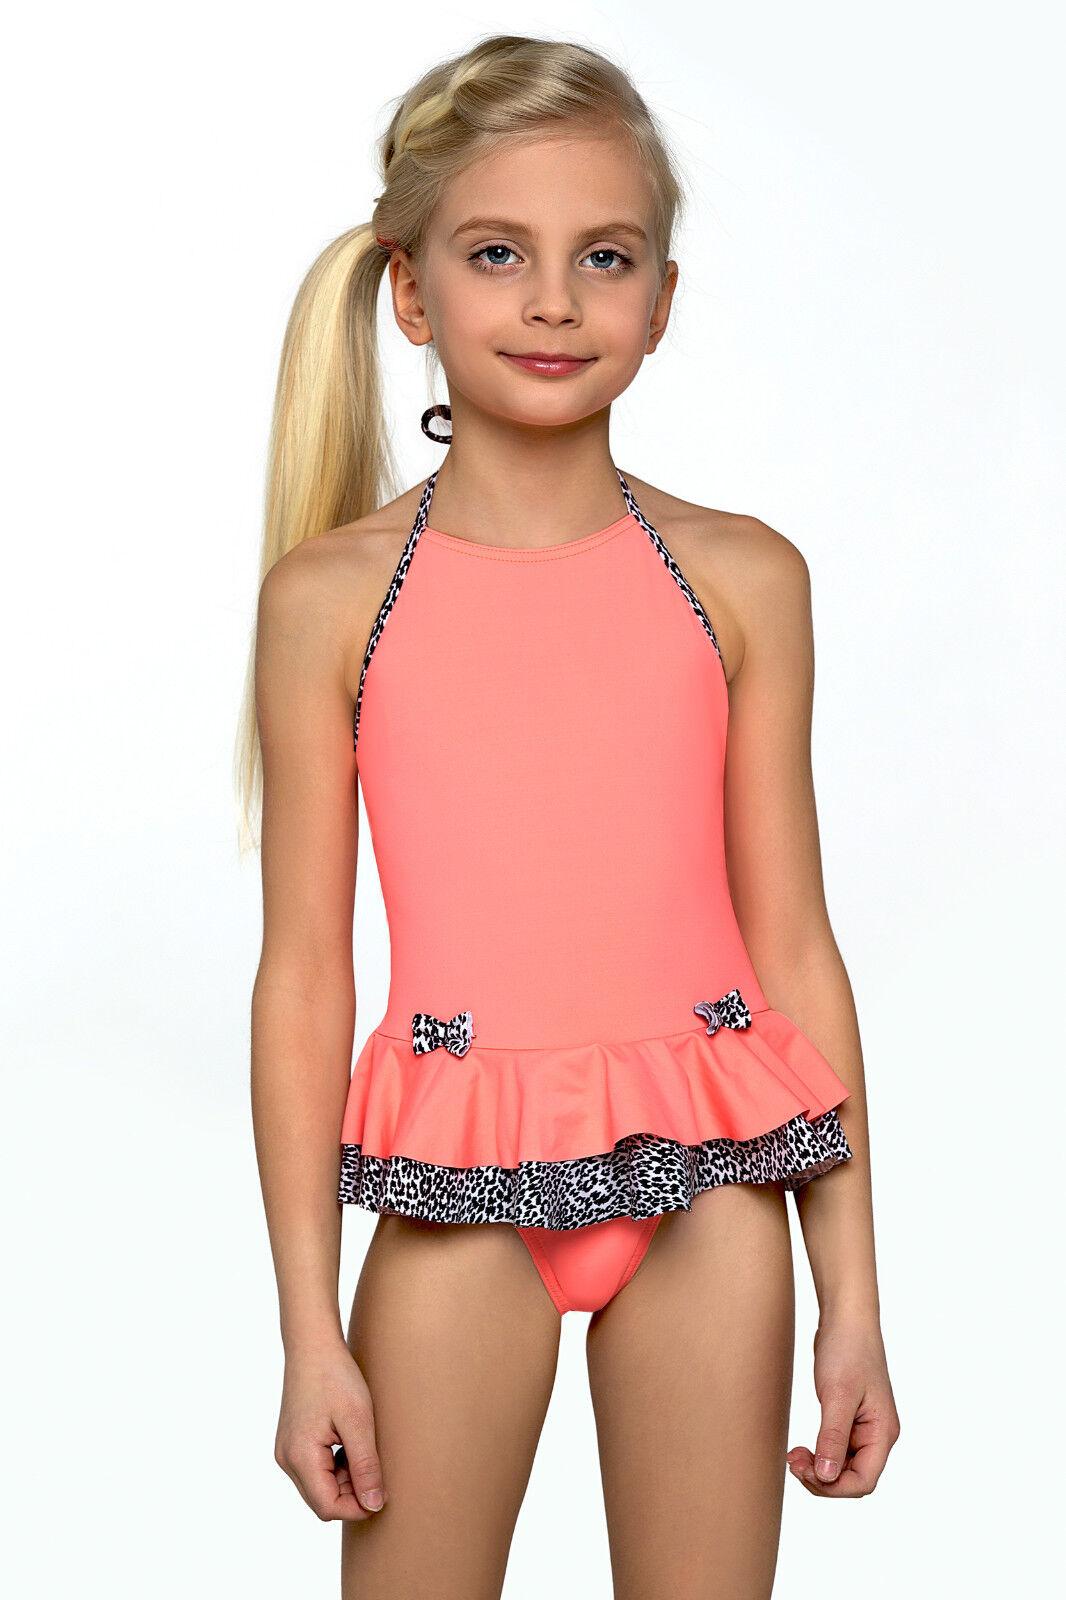 New Little Girls Sport Swimming Costume Swimwear Swimsuit Kids Age 3 4 5 6 7  sc 1 st  eBay & New Little Girls Sport Swimming Costume Swimwear Swimsuit Kids Age 3 ...